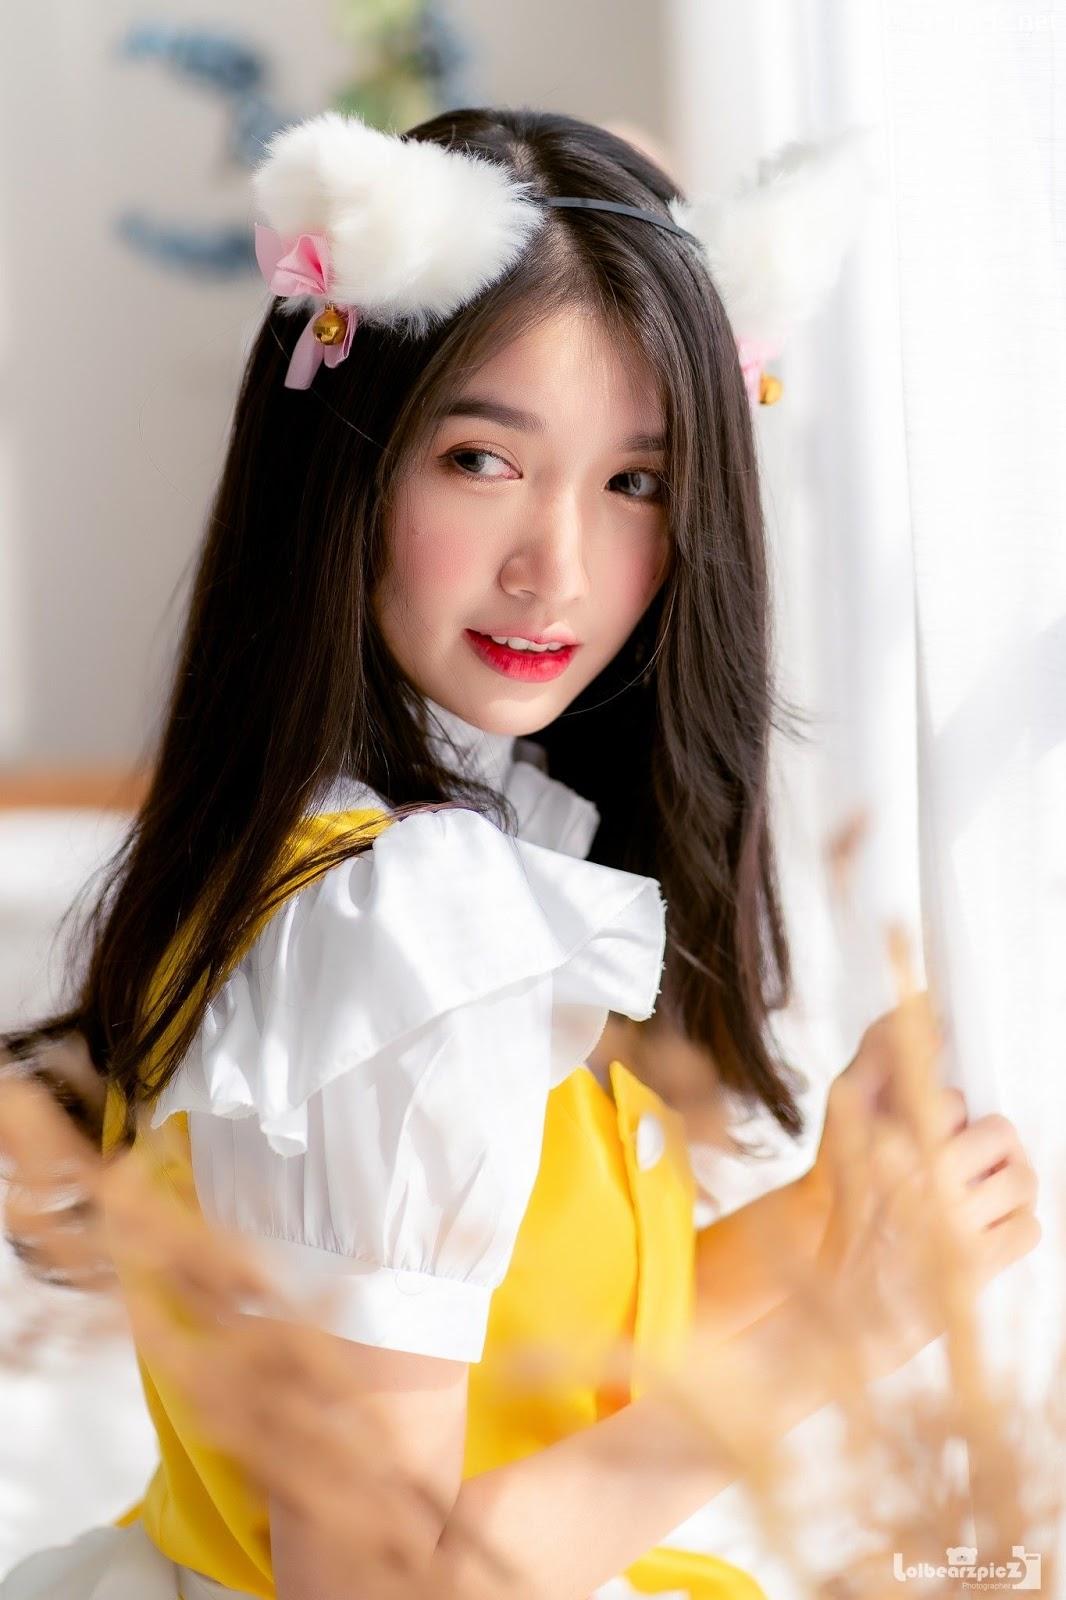 Image Thailand Model - Yatawee Limsiripothong - Cute Maid - TruePic.net - Picture-3